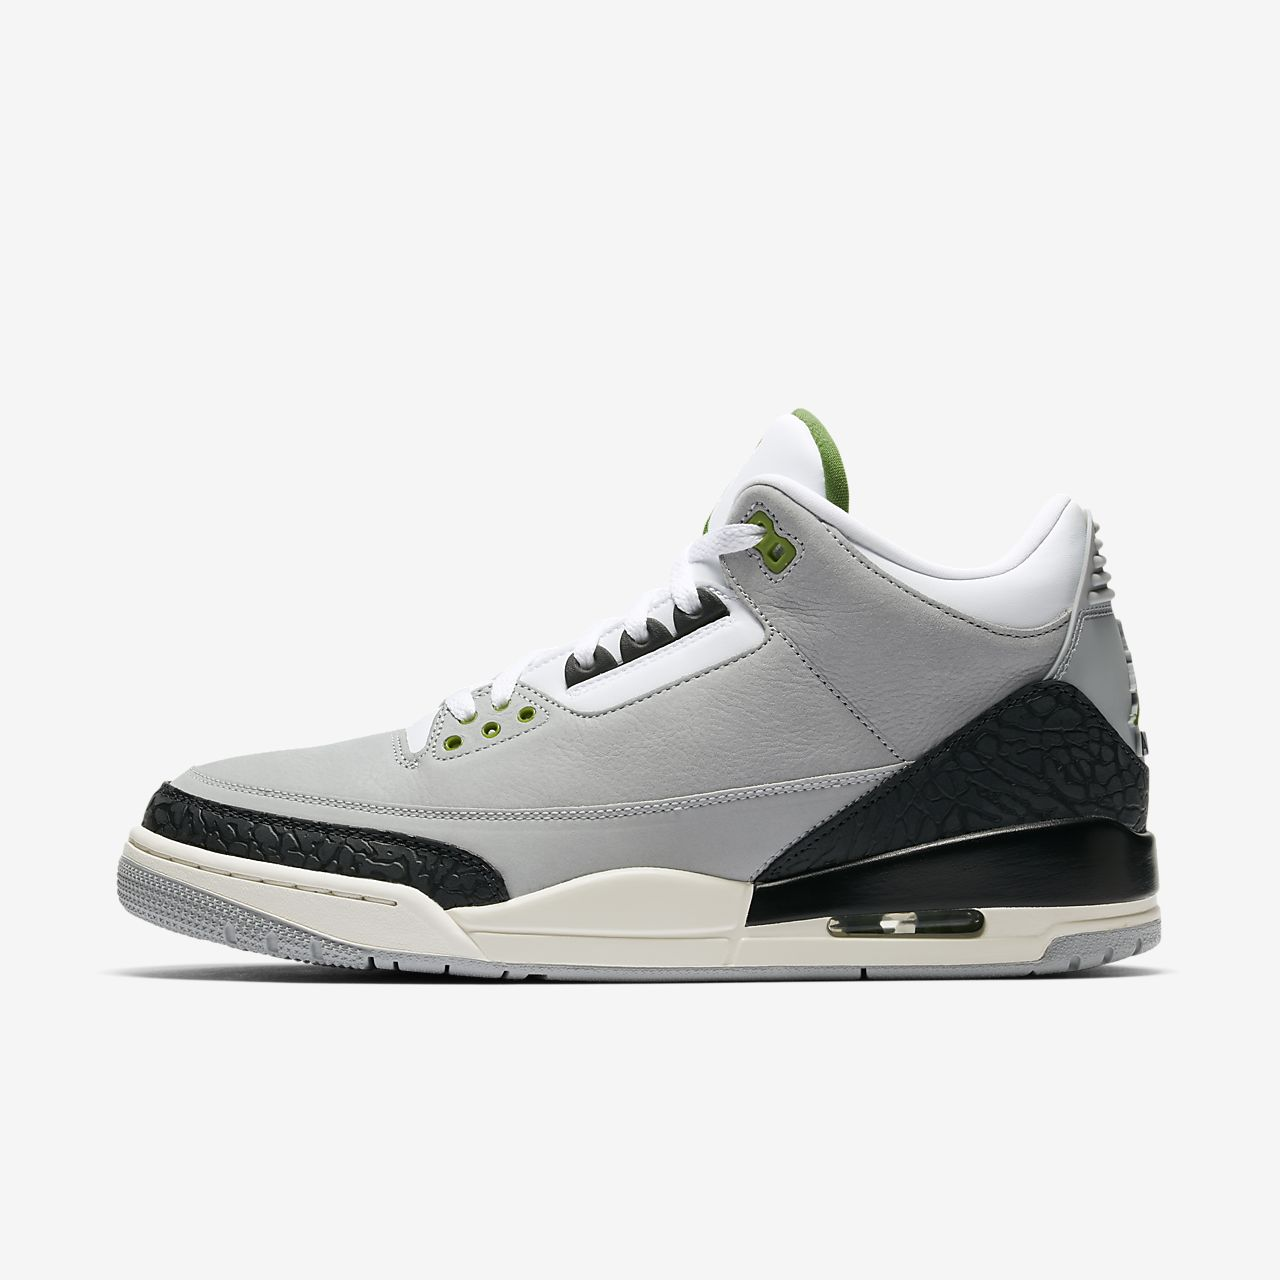 902bb1ba6c Scarpa Air Jordan 3 Retro - Uomo. Nike.com IT